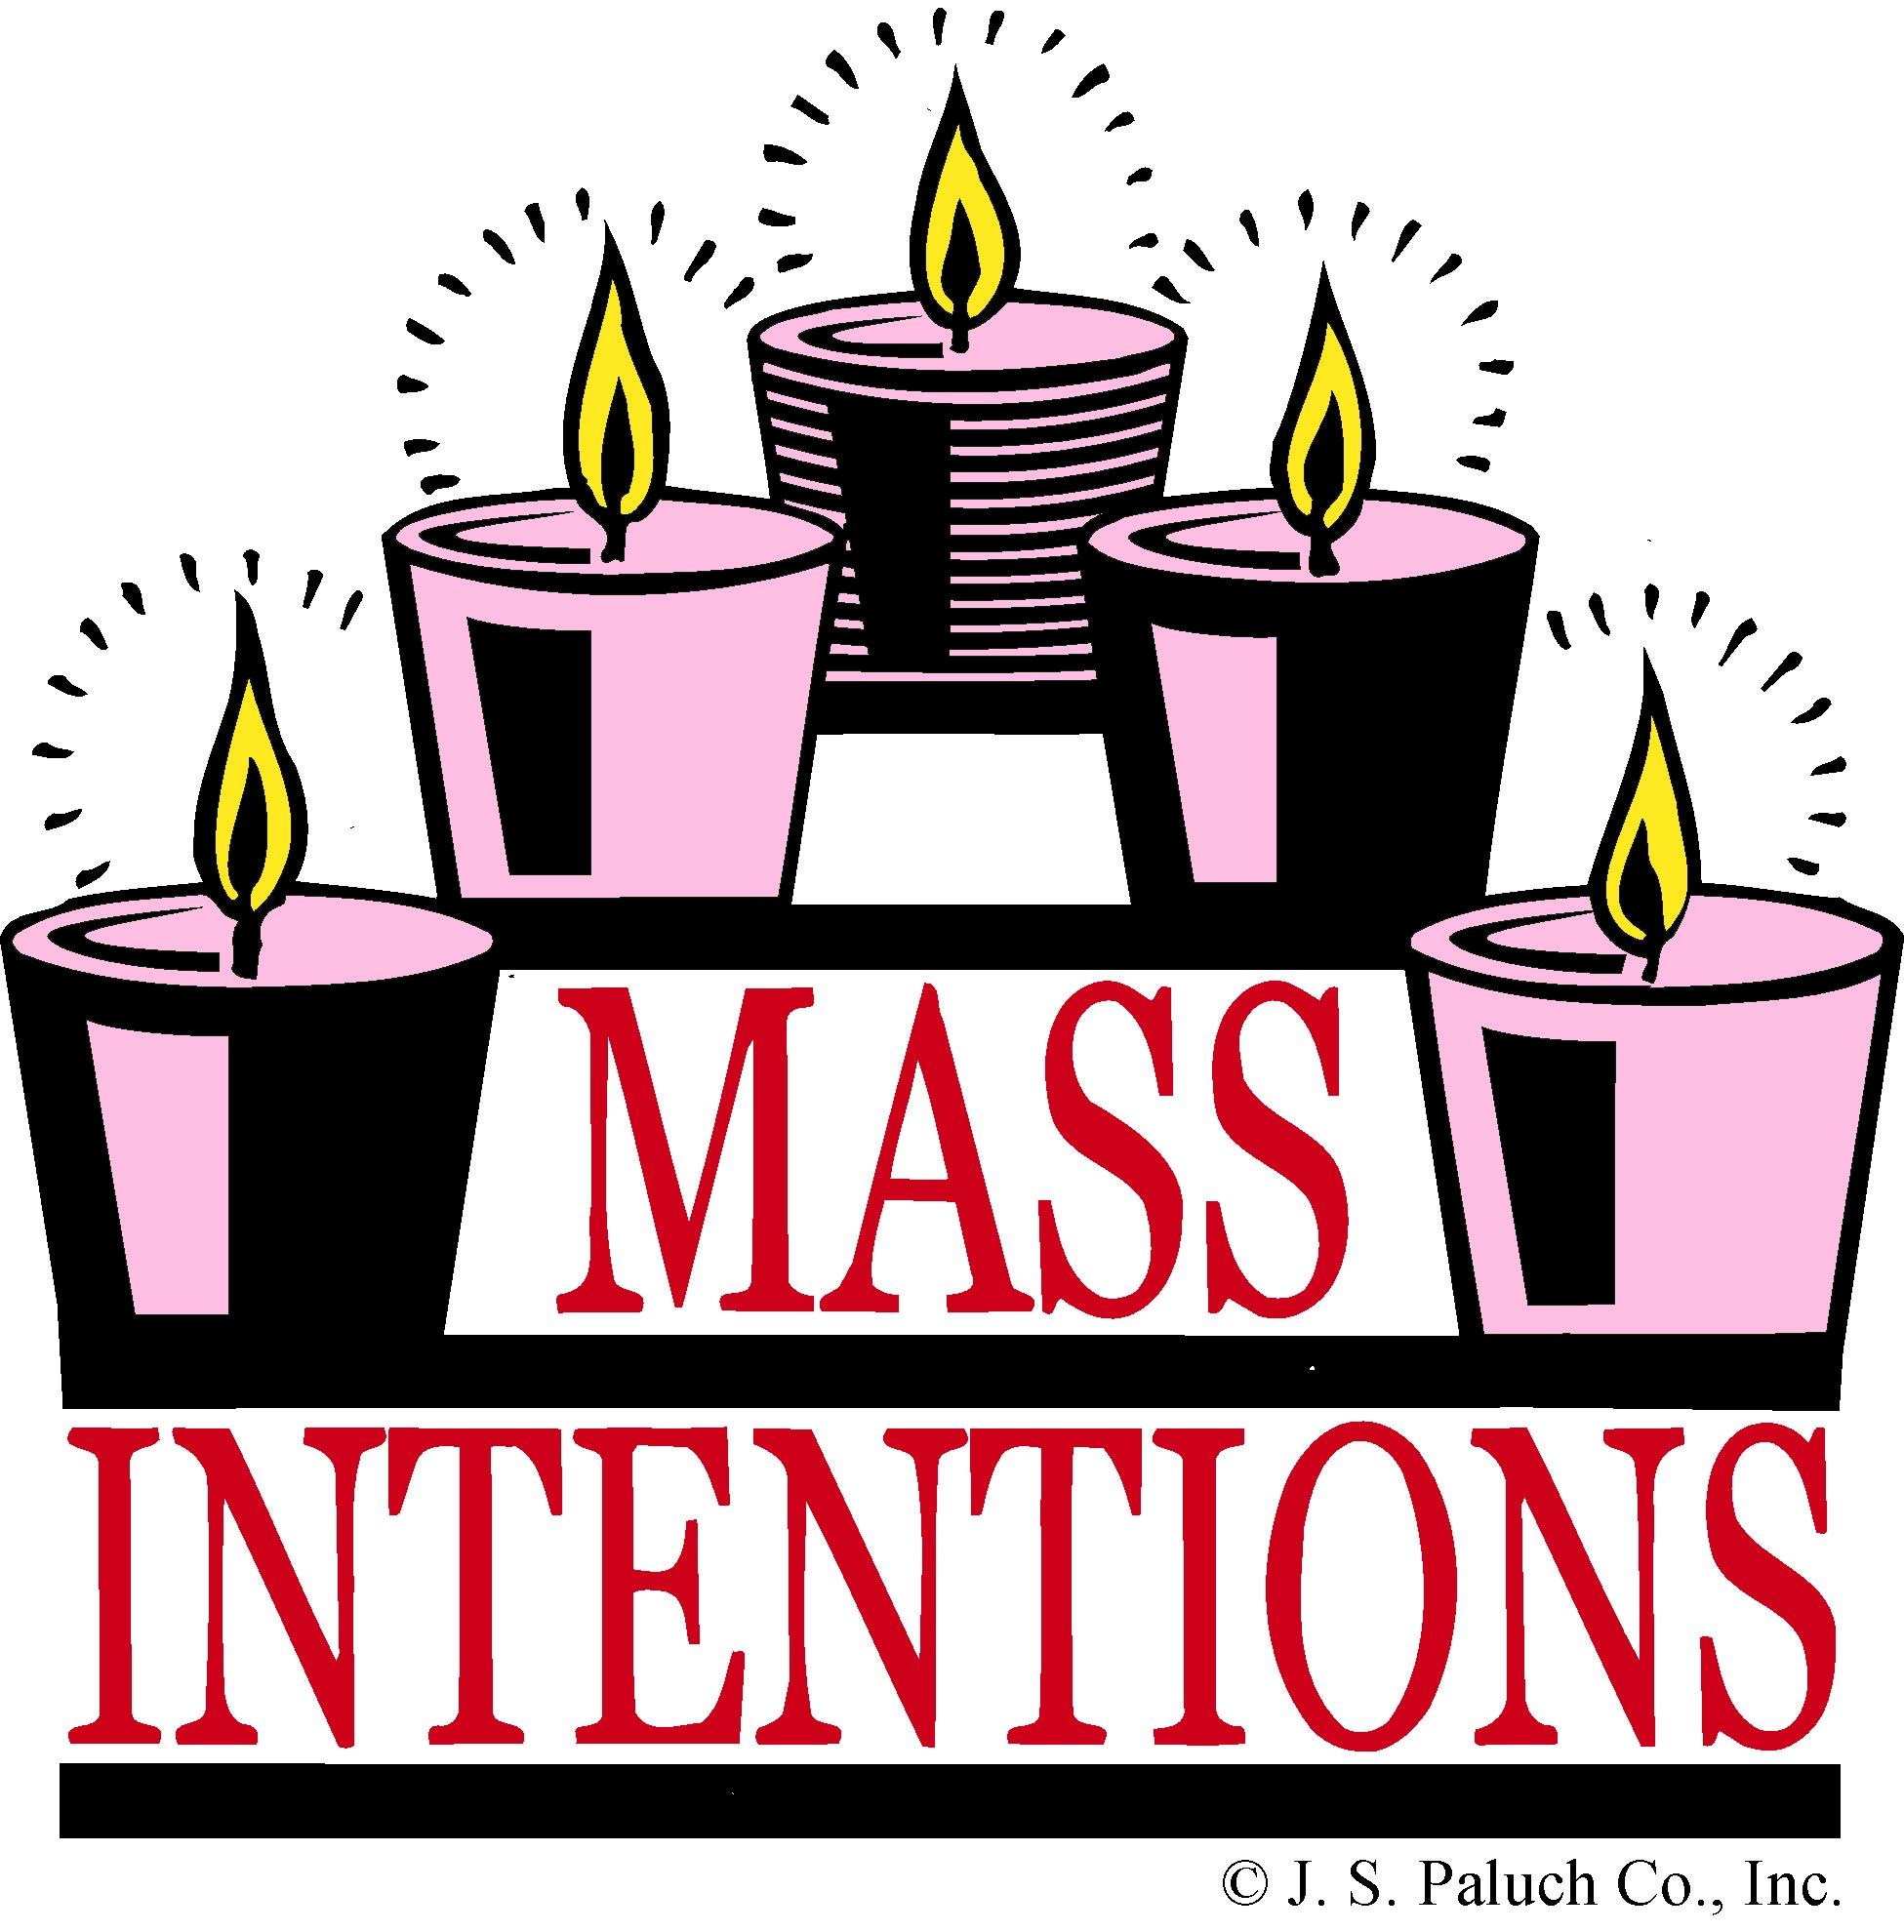 Catholic clipart catholic mass. Intentions diocese of lexington